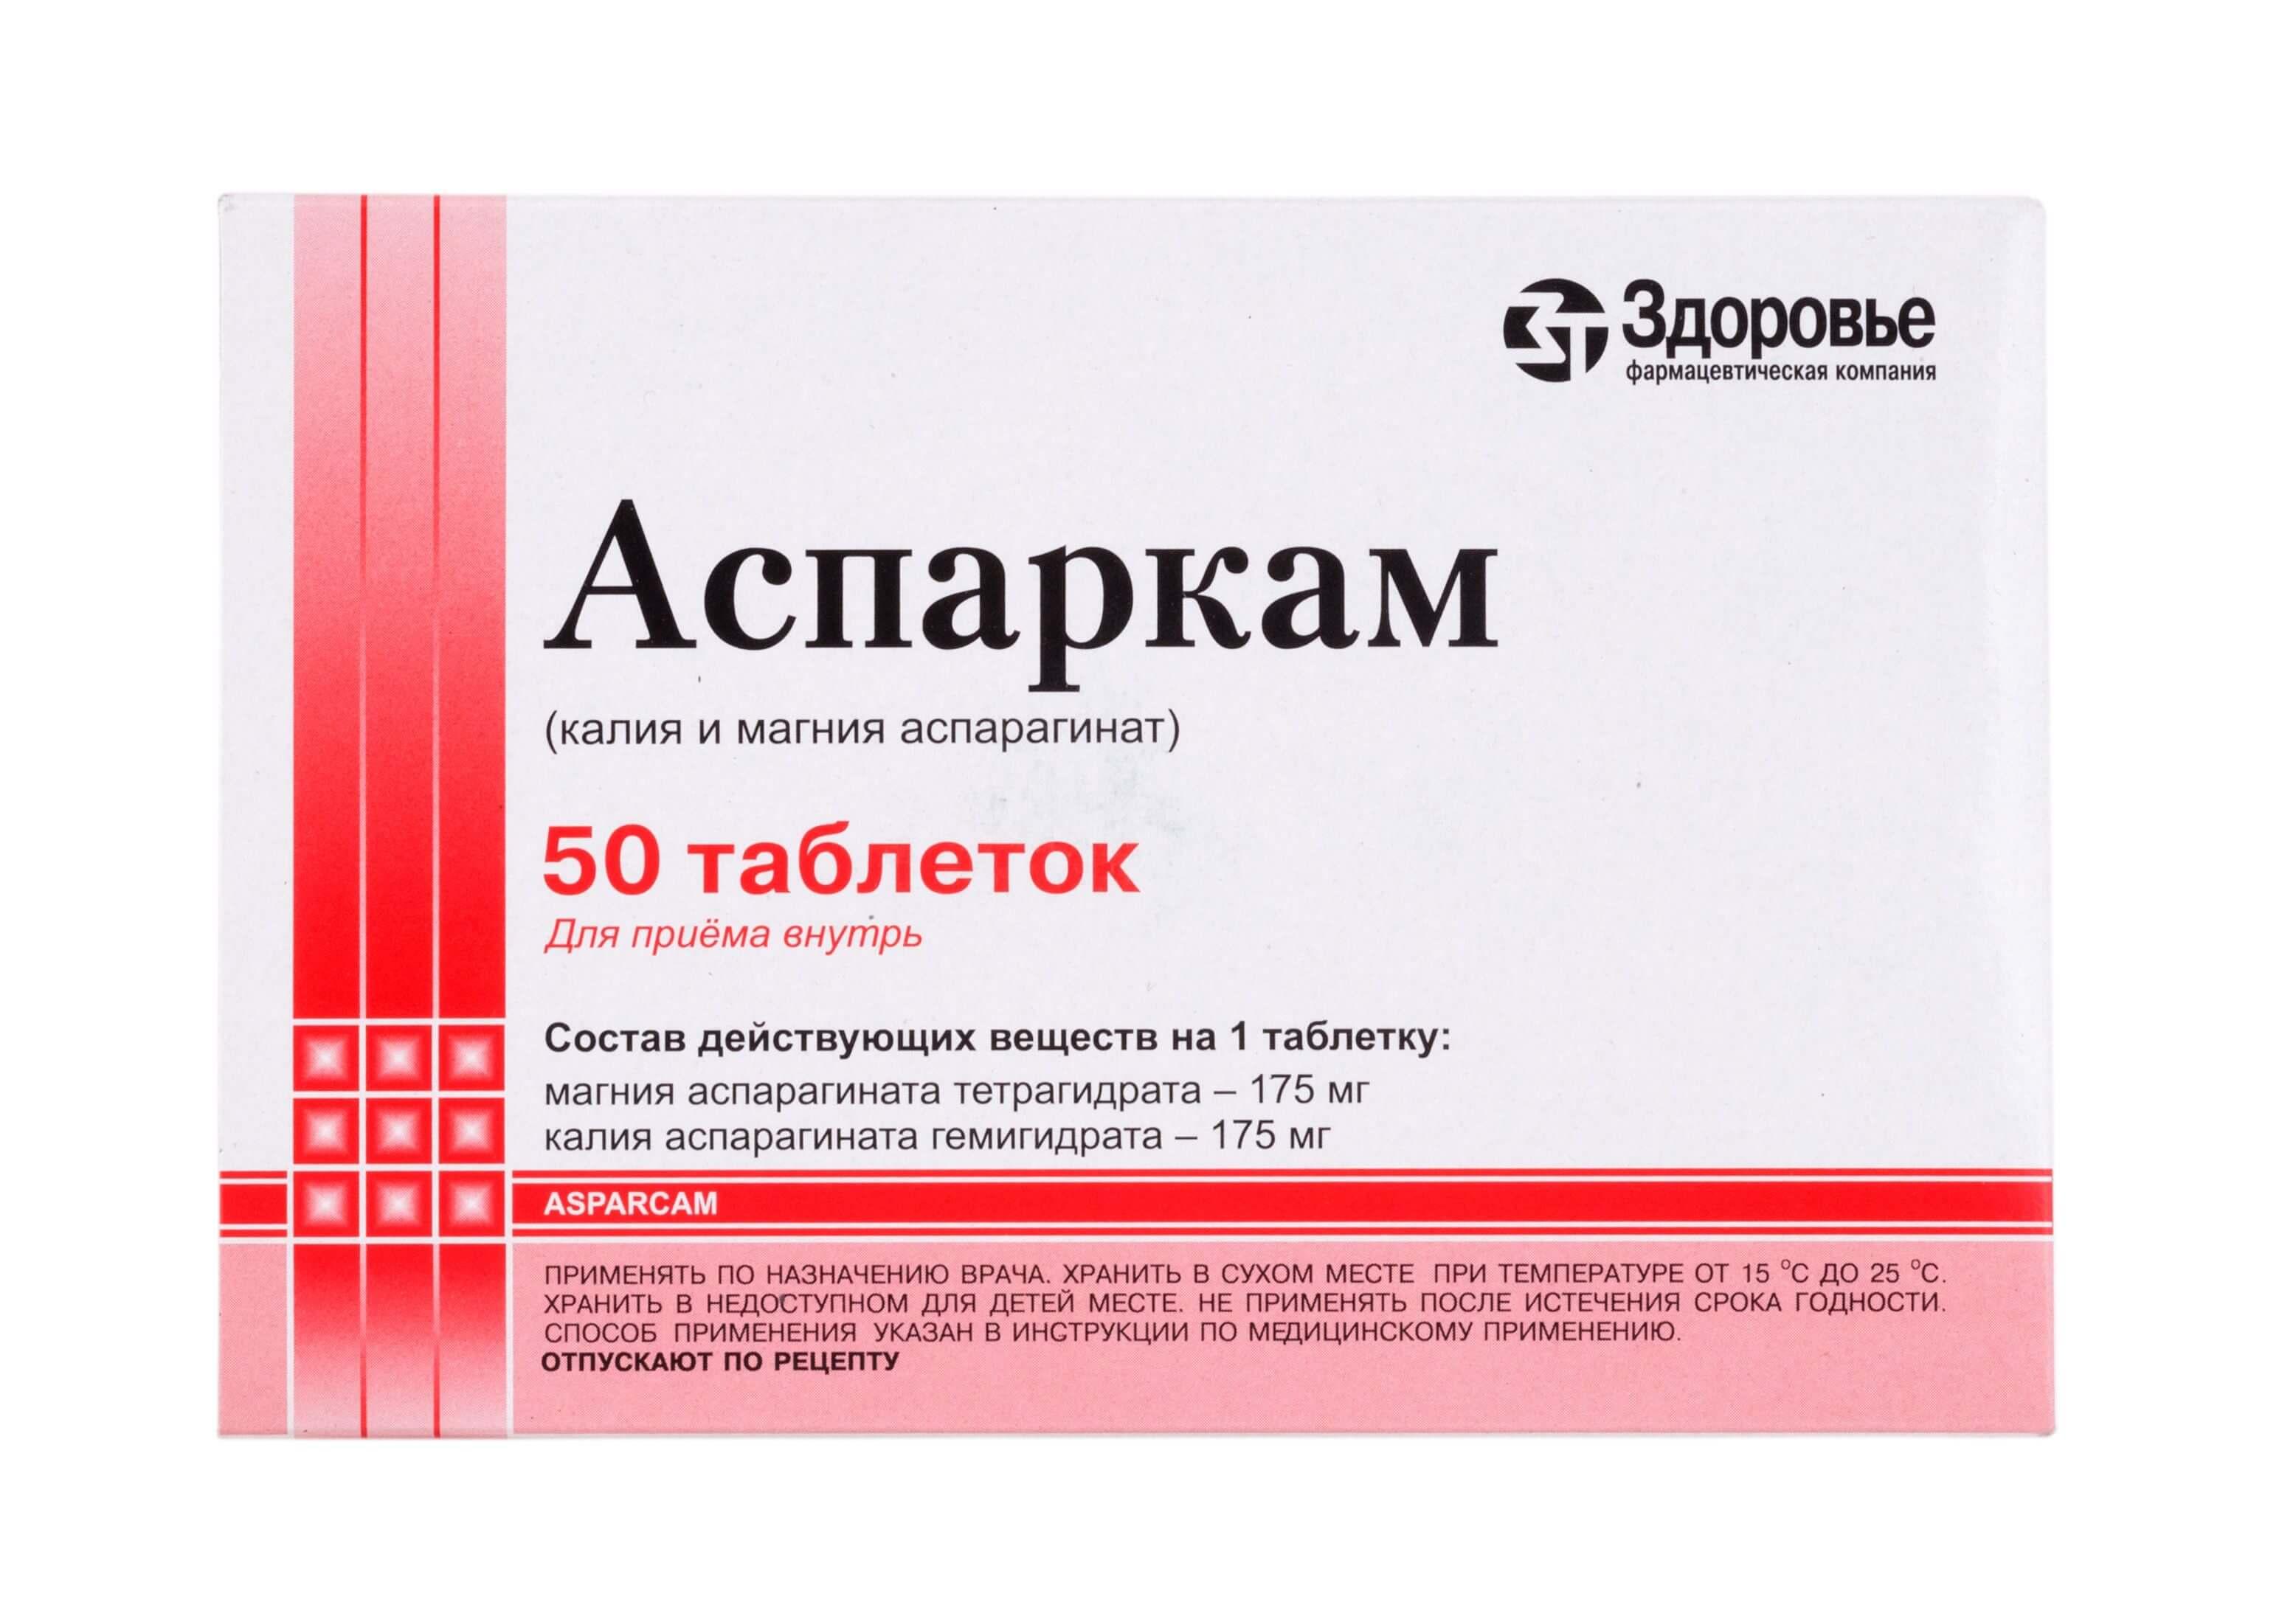 Аспаркам: инструкция по применению таблеток